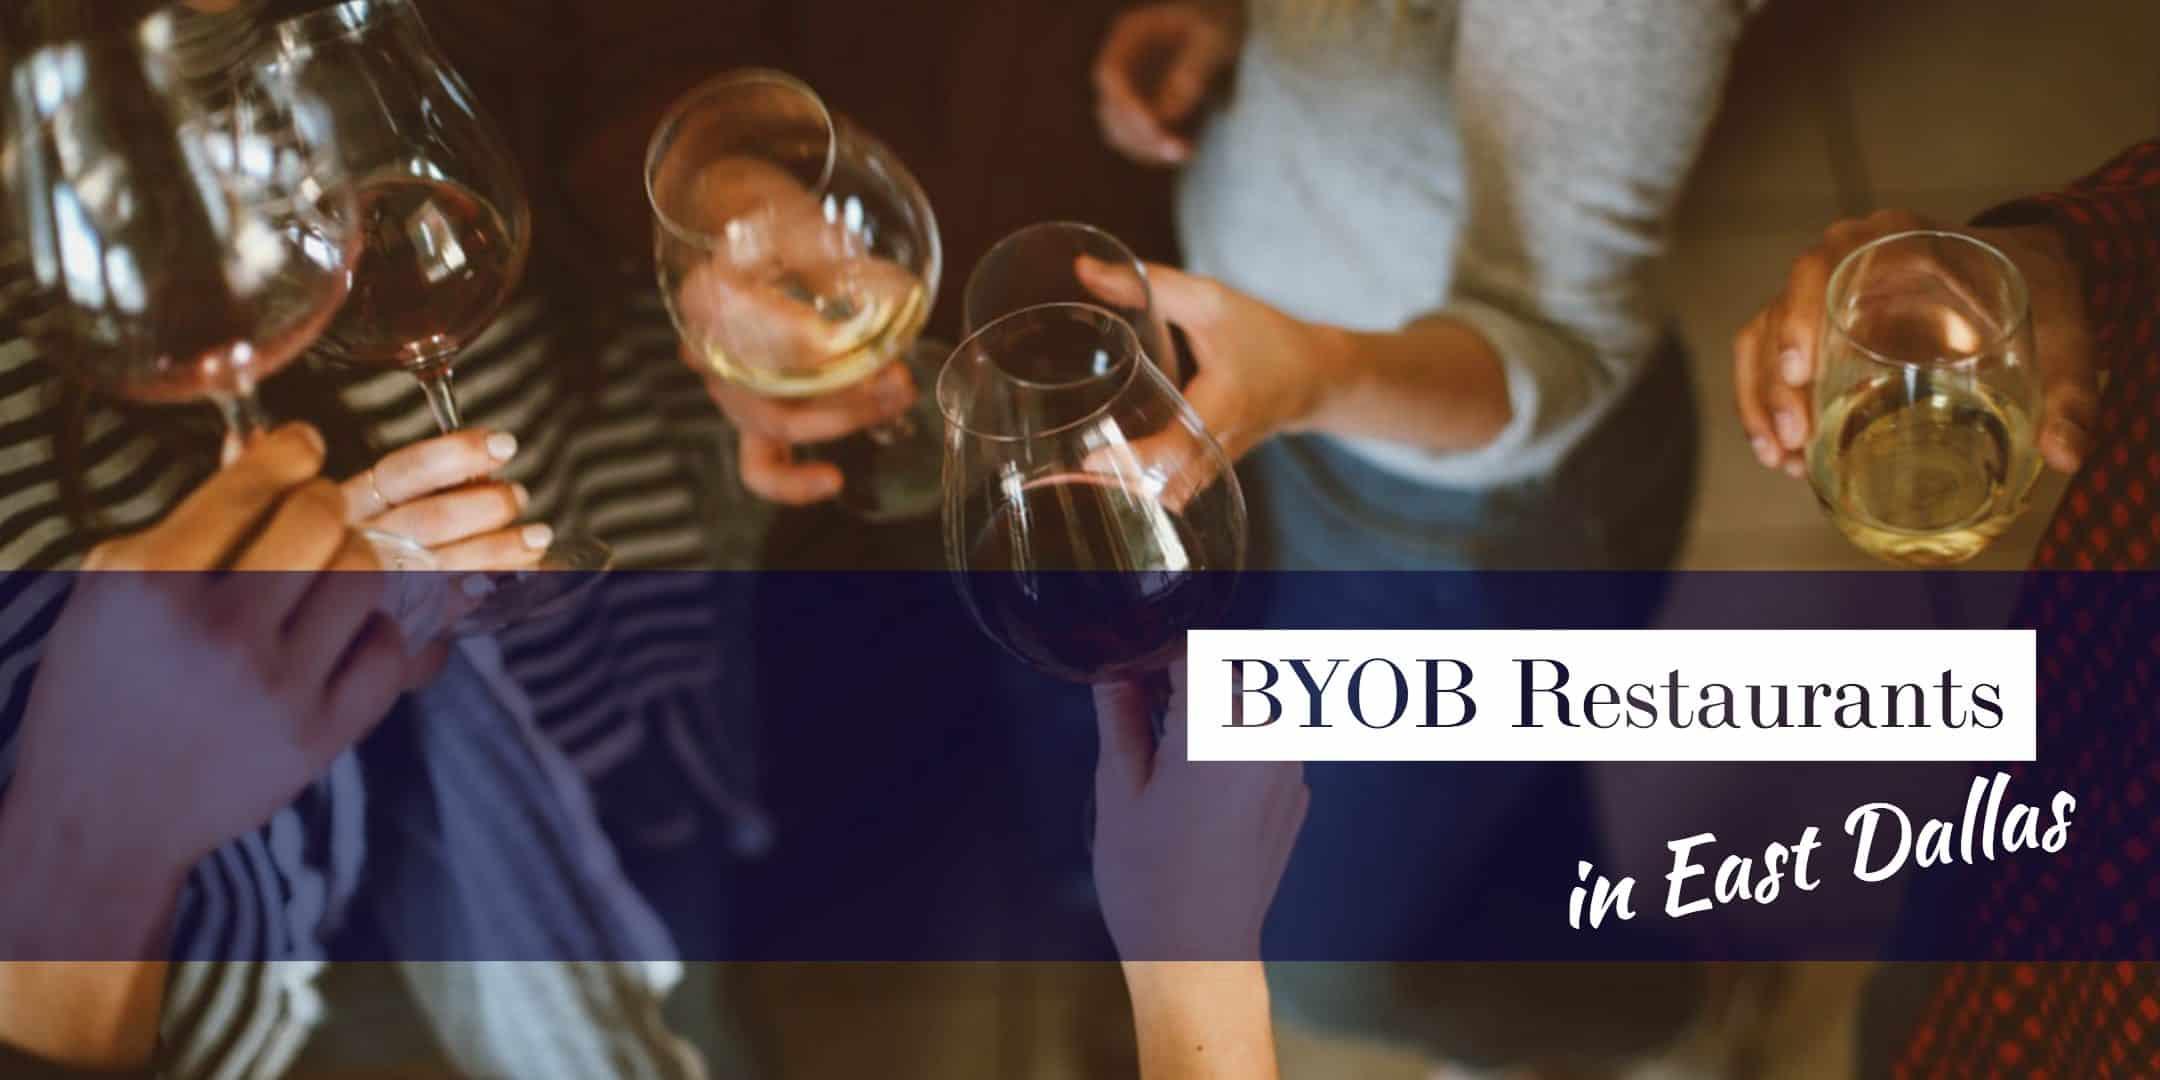 BYOB Restaurants in East Dallas